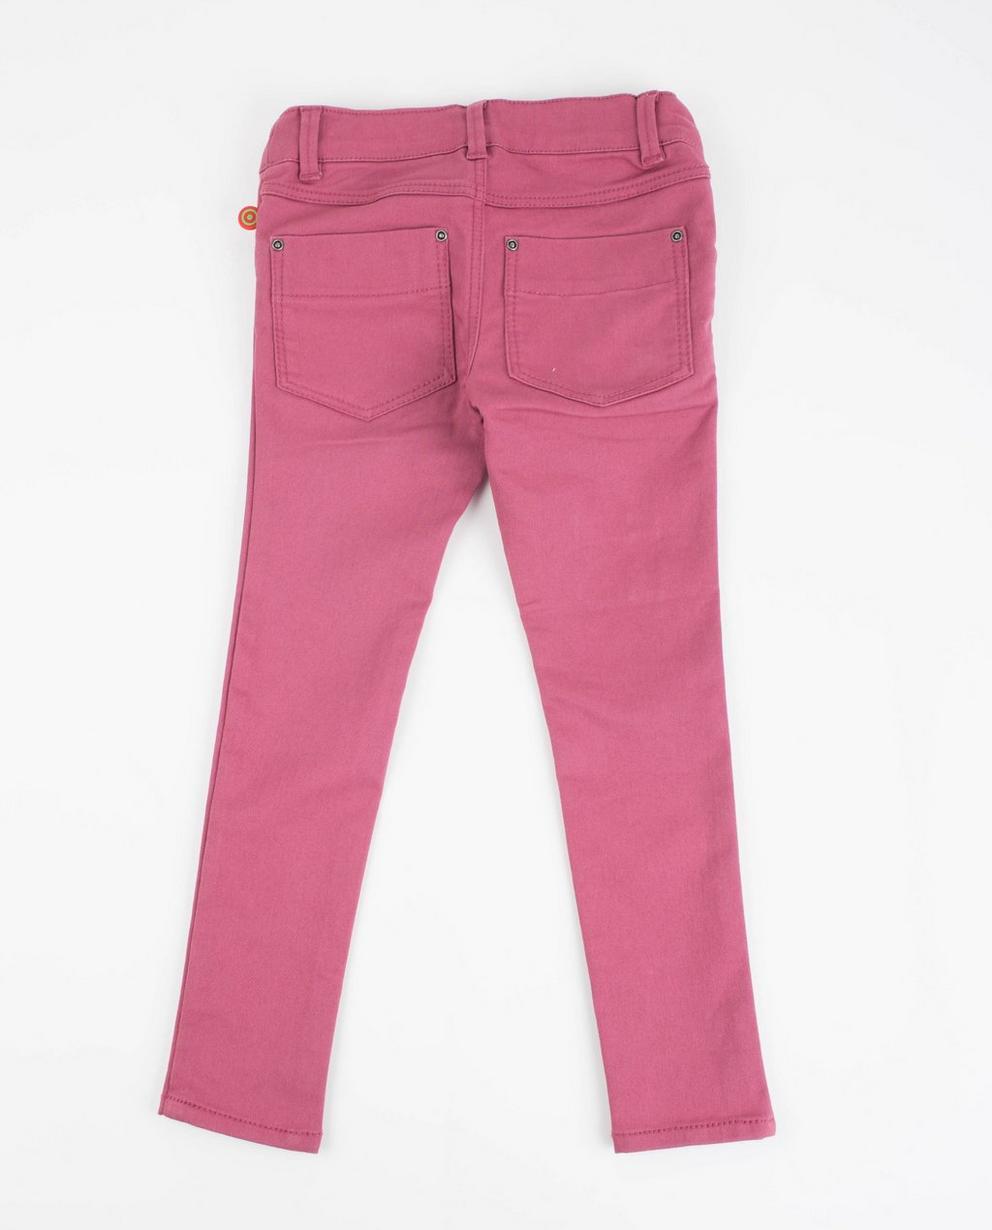 Broeken - RSM - Purperen jeans ZulupaPUWA - Unisex